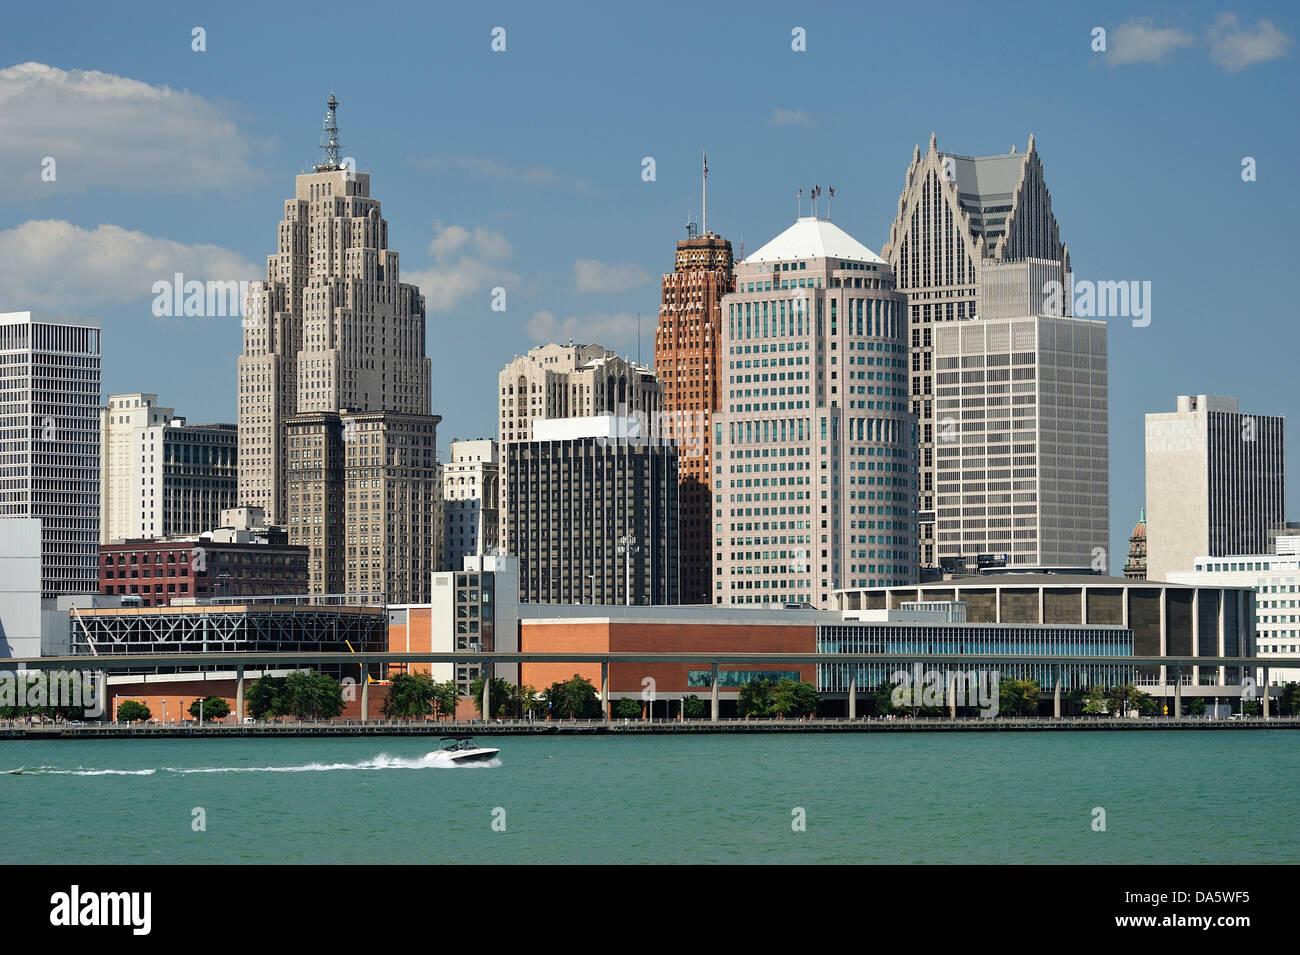 Detroit, Detroit River, river, Financial District, Great Lakes, International Riverfront, Michigan, Mid West, Travel, - Stock Image